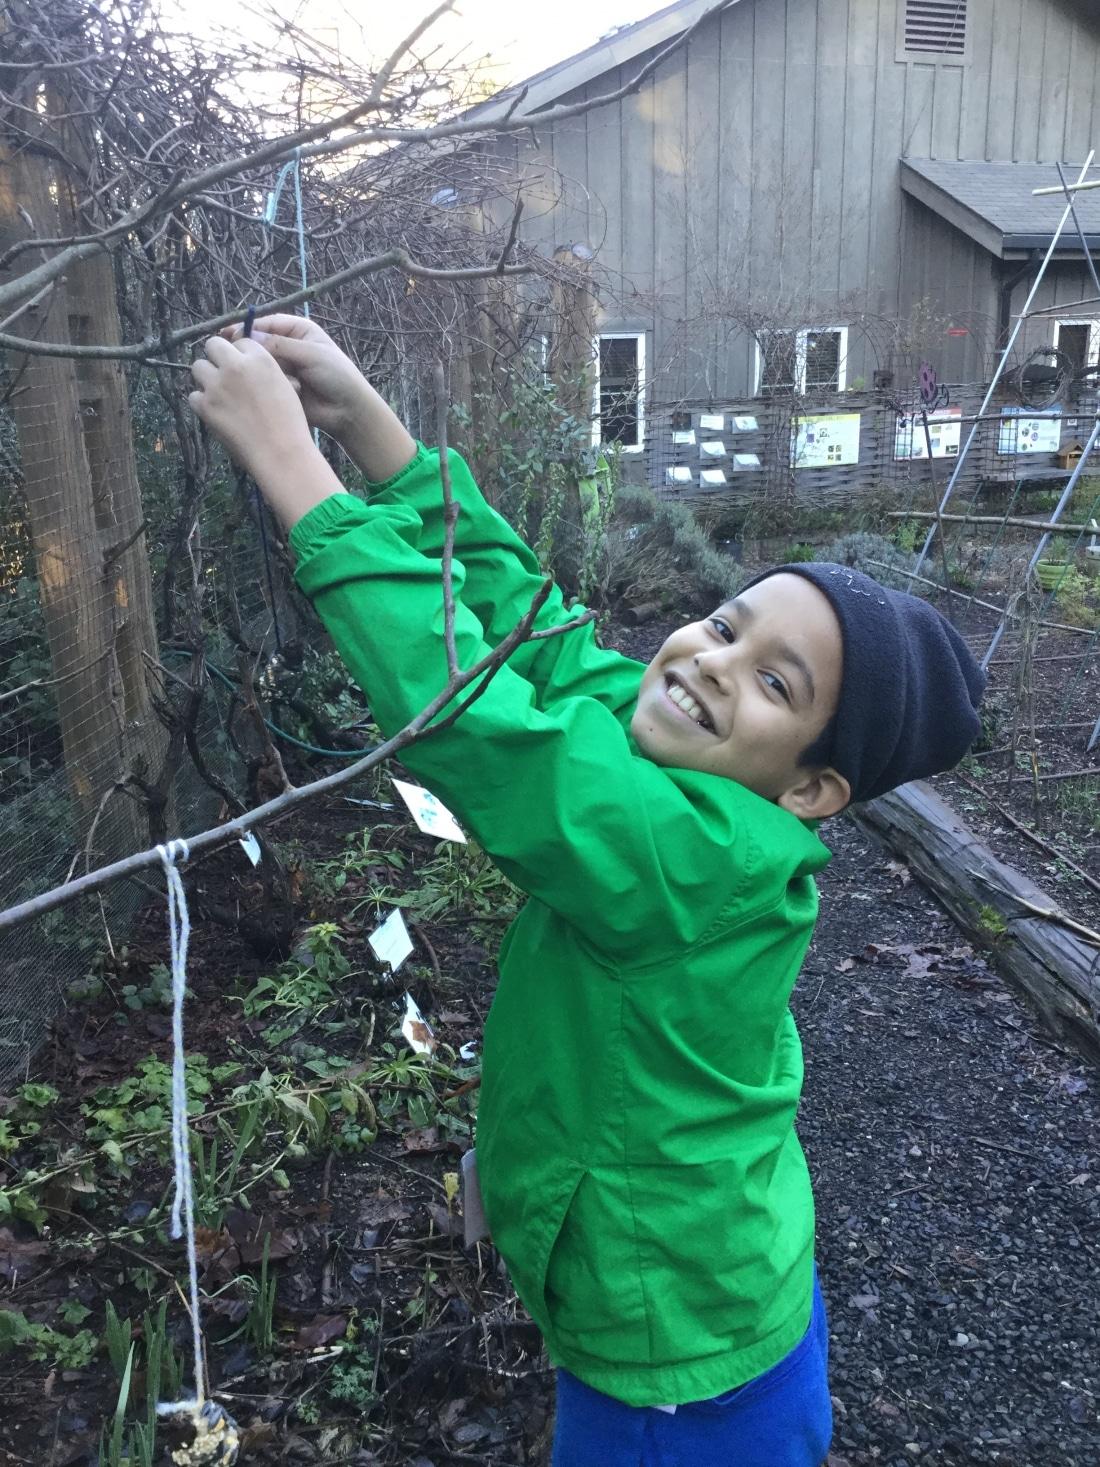 A School Overnight Program student hangs a bird feeder in the garden.